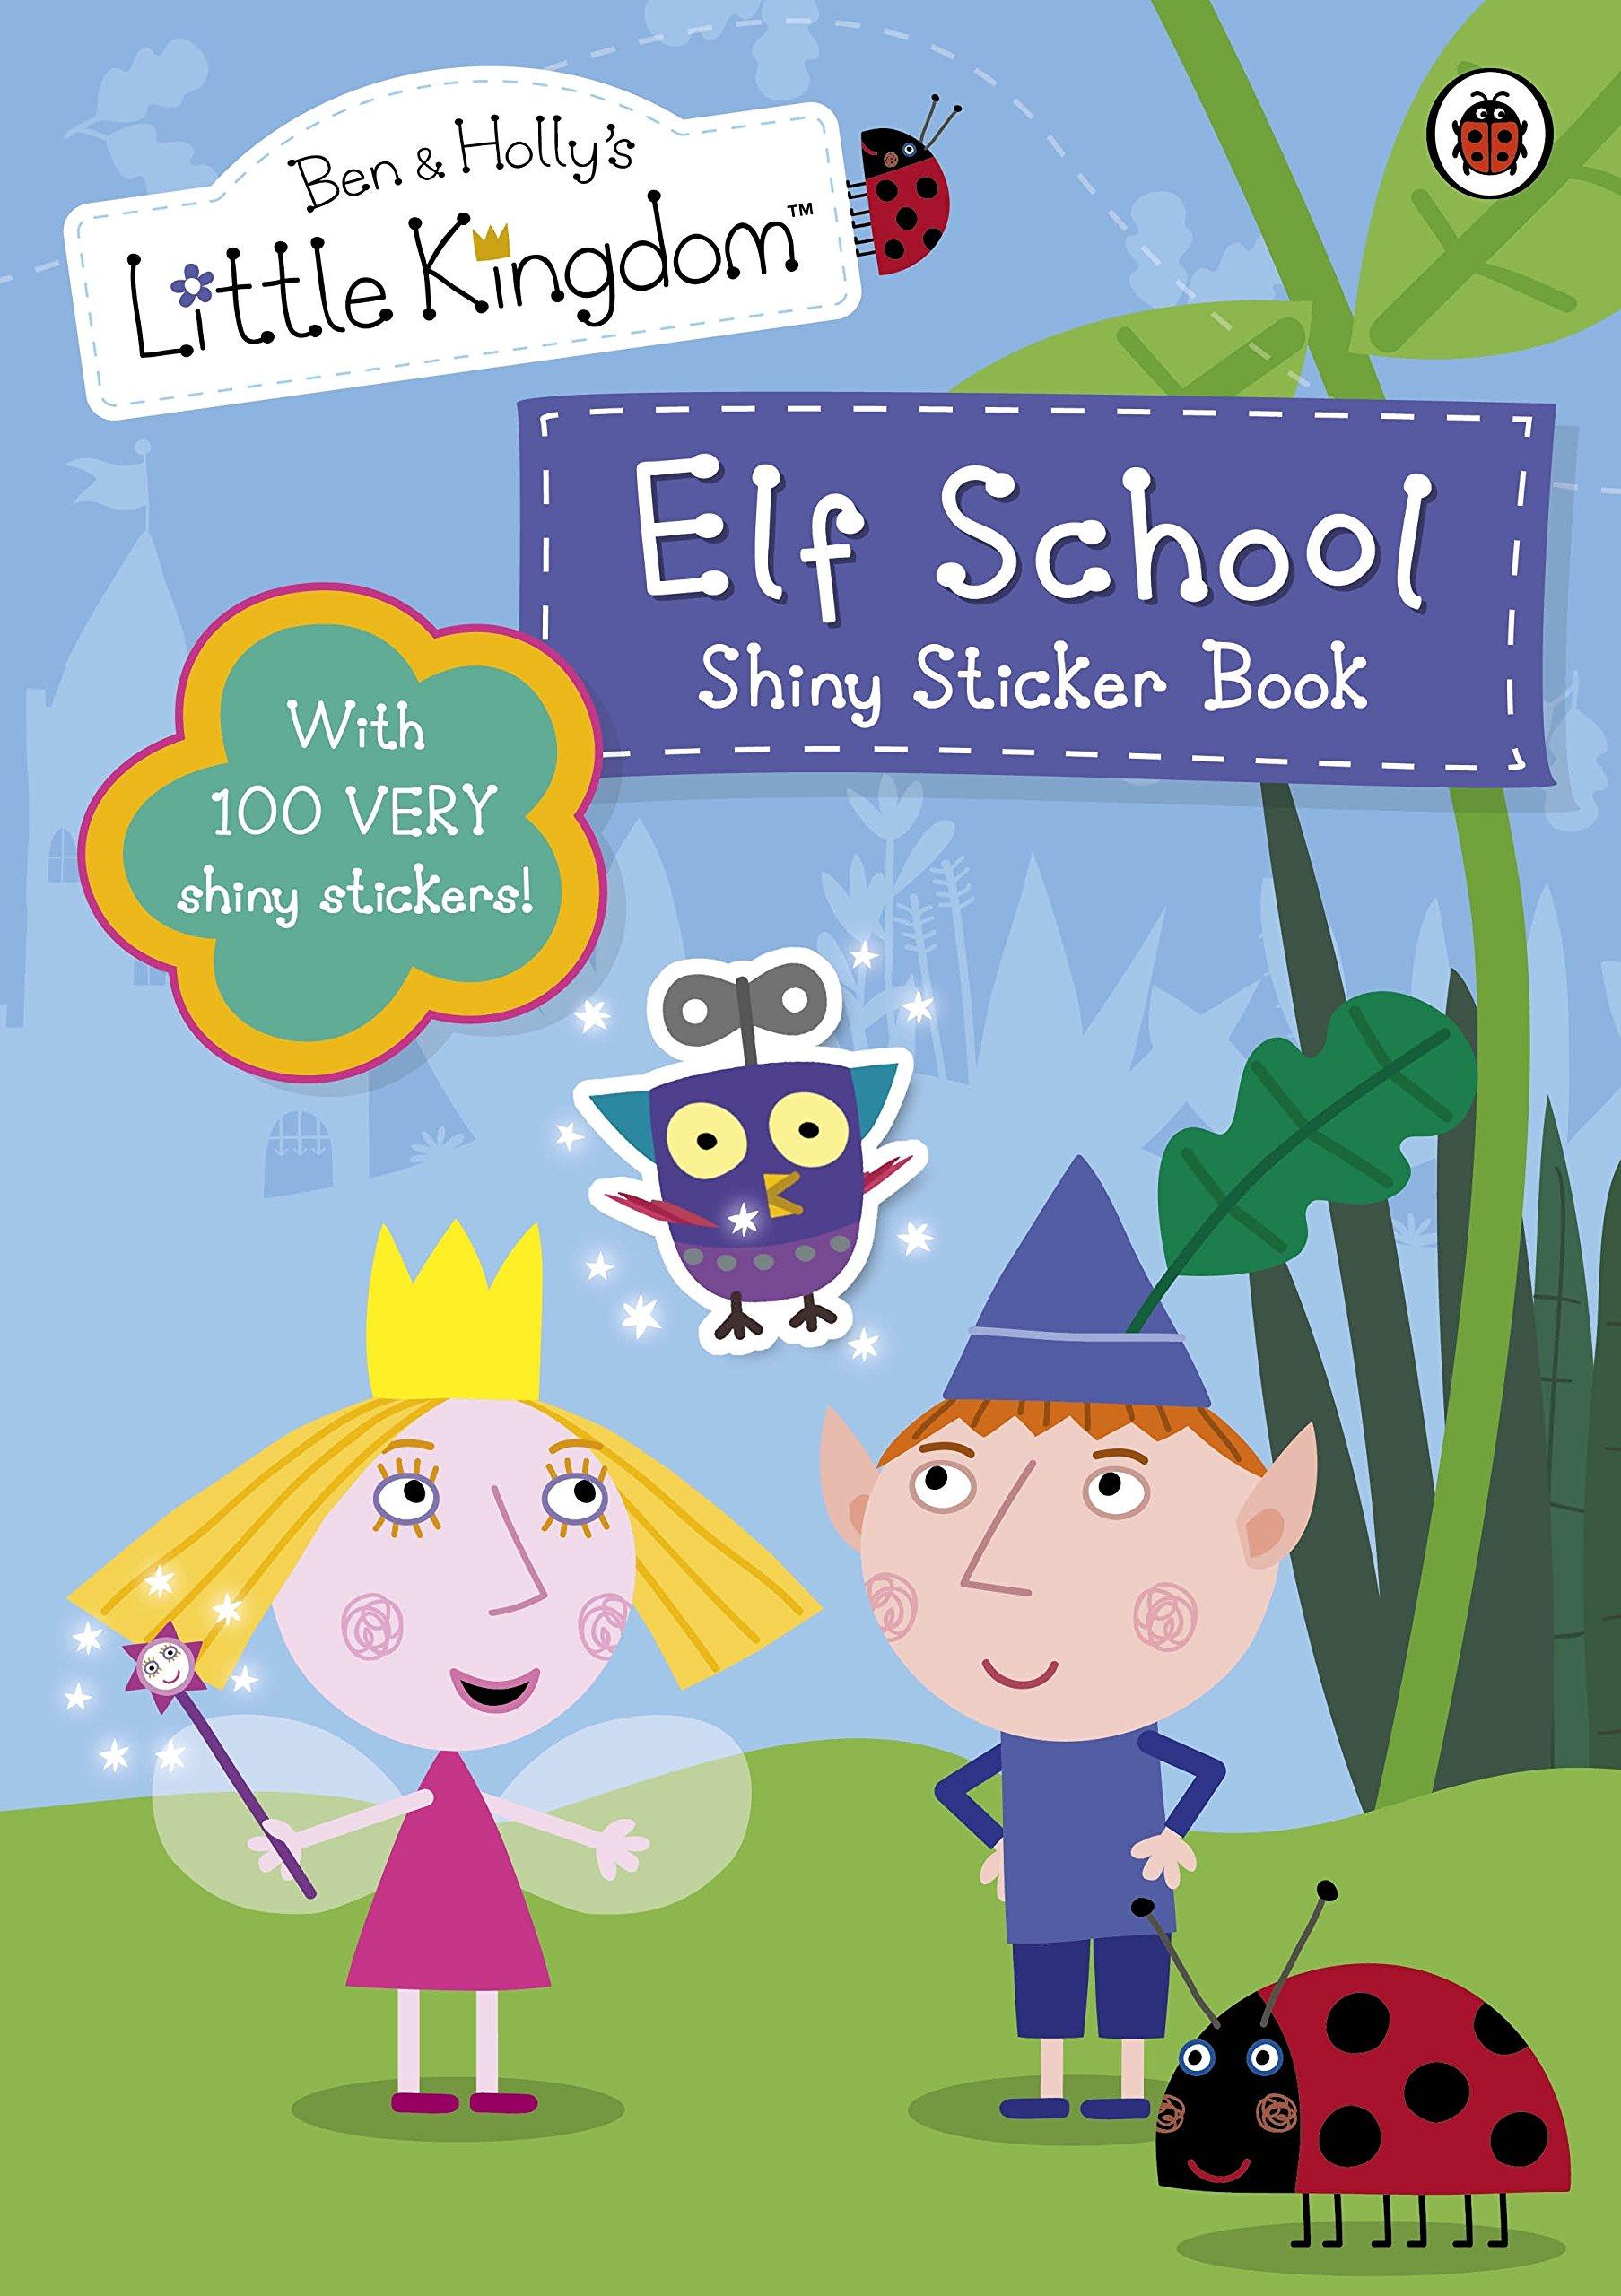 Little merchants sticker kamos sticker wall source buy ben and holly s little kingdom elf school shiny sticker book amipublicfo Images